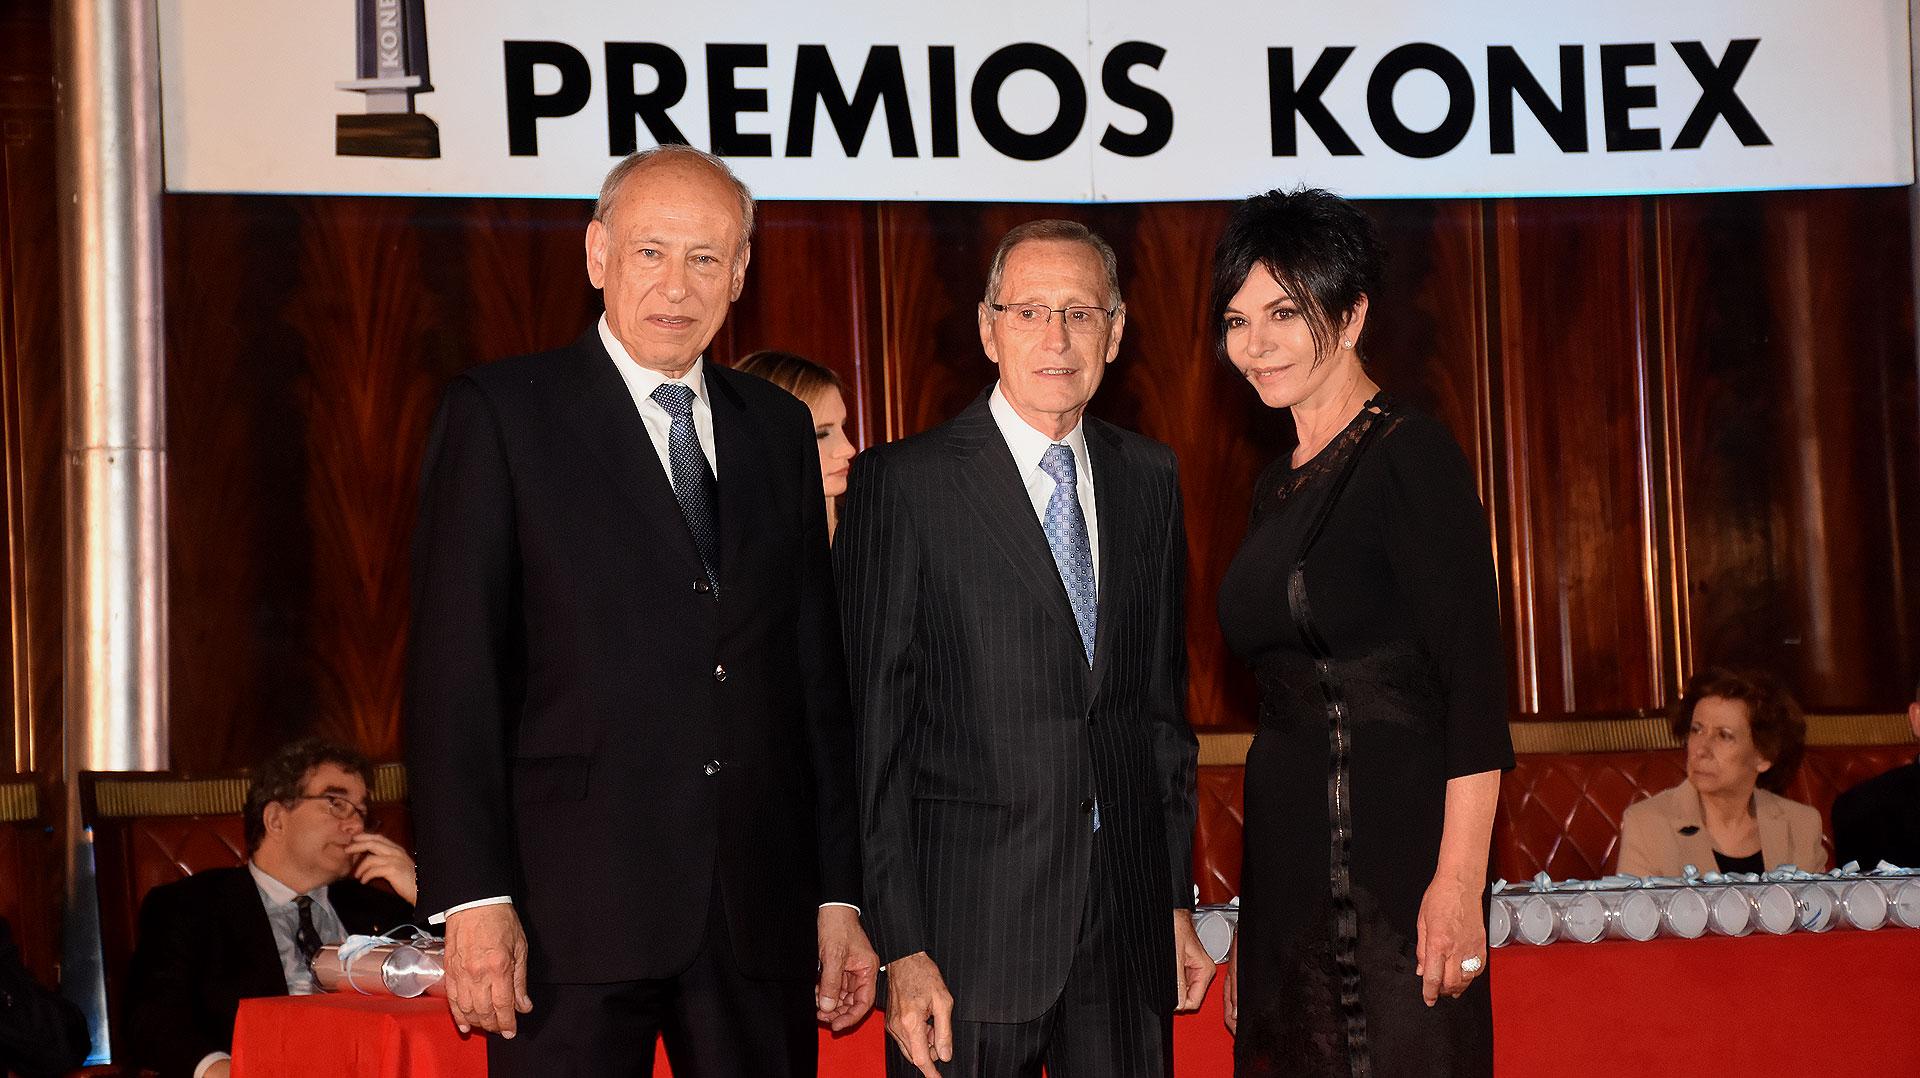 Luis Ovsejevich, Adalberto Rodríguez Giavarini y Mónica Gutiérrez (integrante del Gran Jurado. Konex 1997: Televisiva. Jurado Premios Konex 2017)